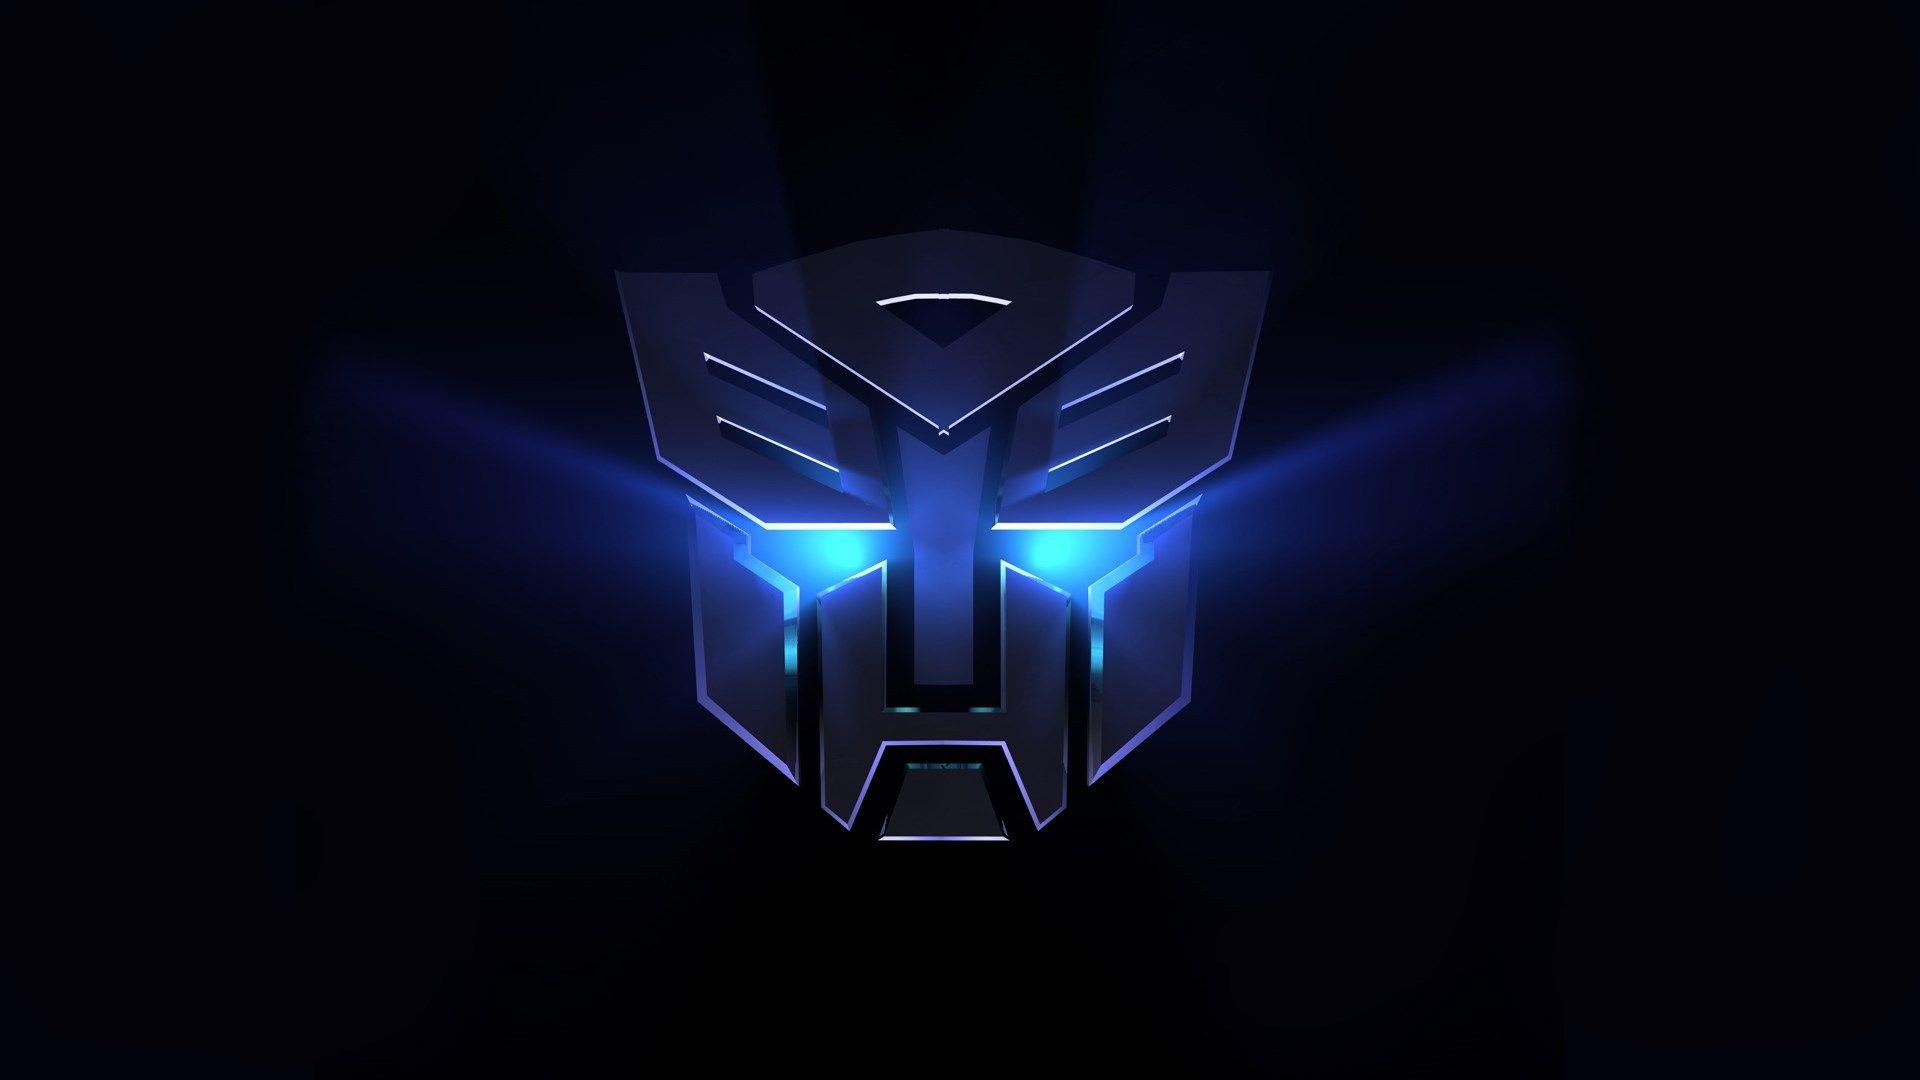 Transformers Macbook Wallpapers Hd Transformer Logo Autobots Logo Transformers Decepticons